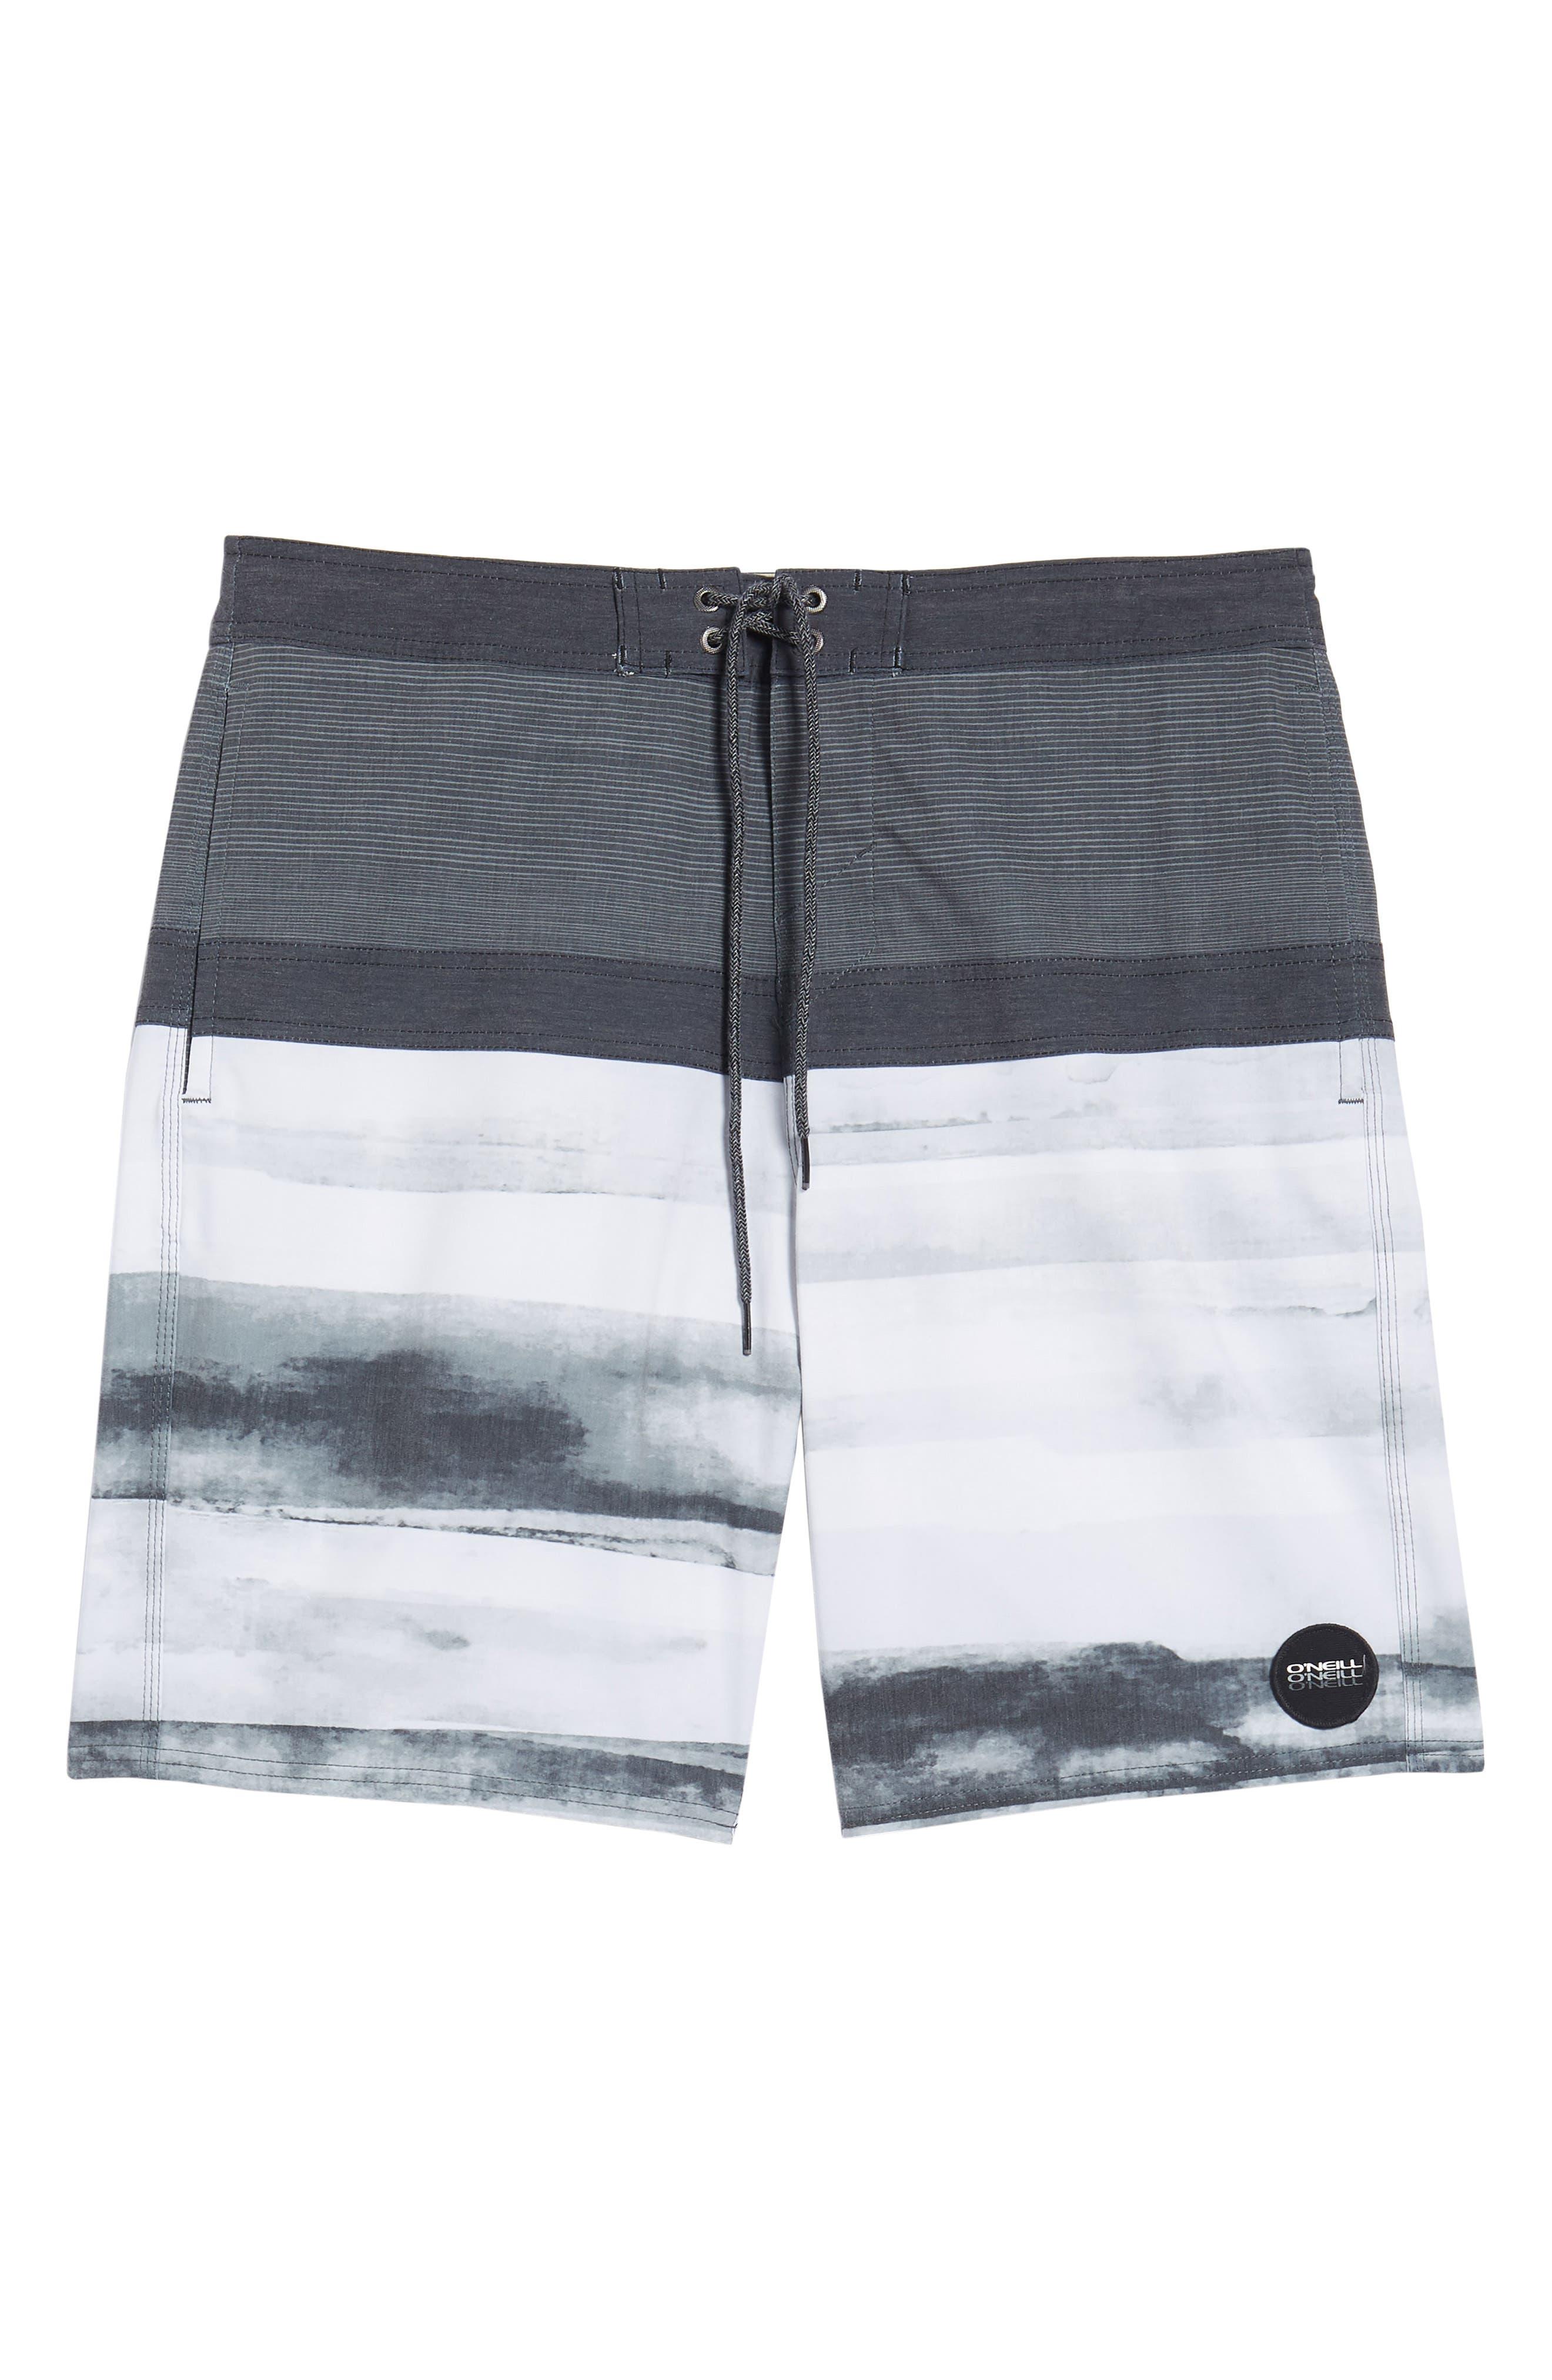 Breaker Cruzer Board Shorts,                             Alternate thumbnail 6, color,                             Black